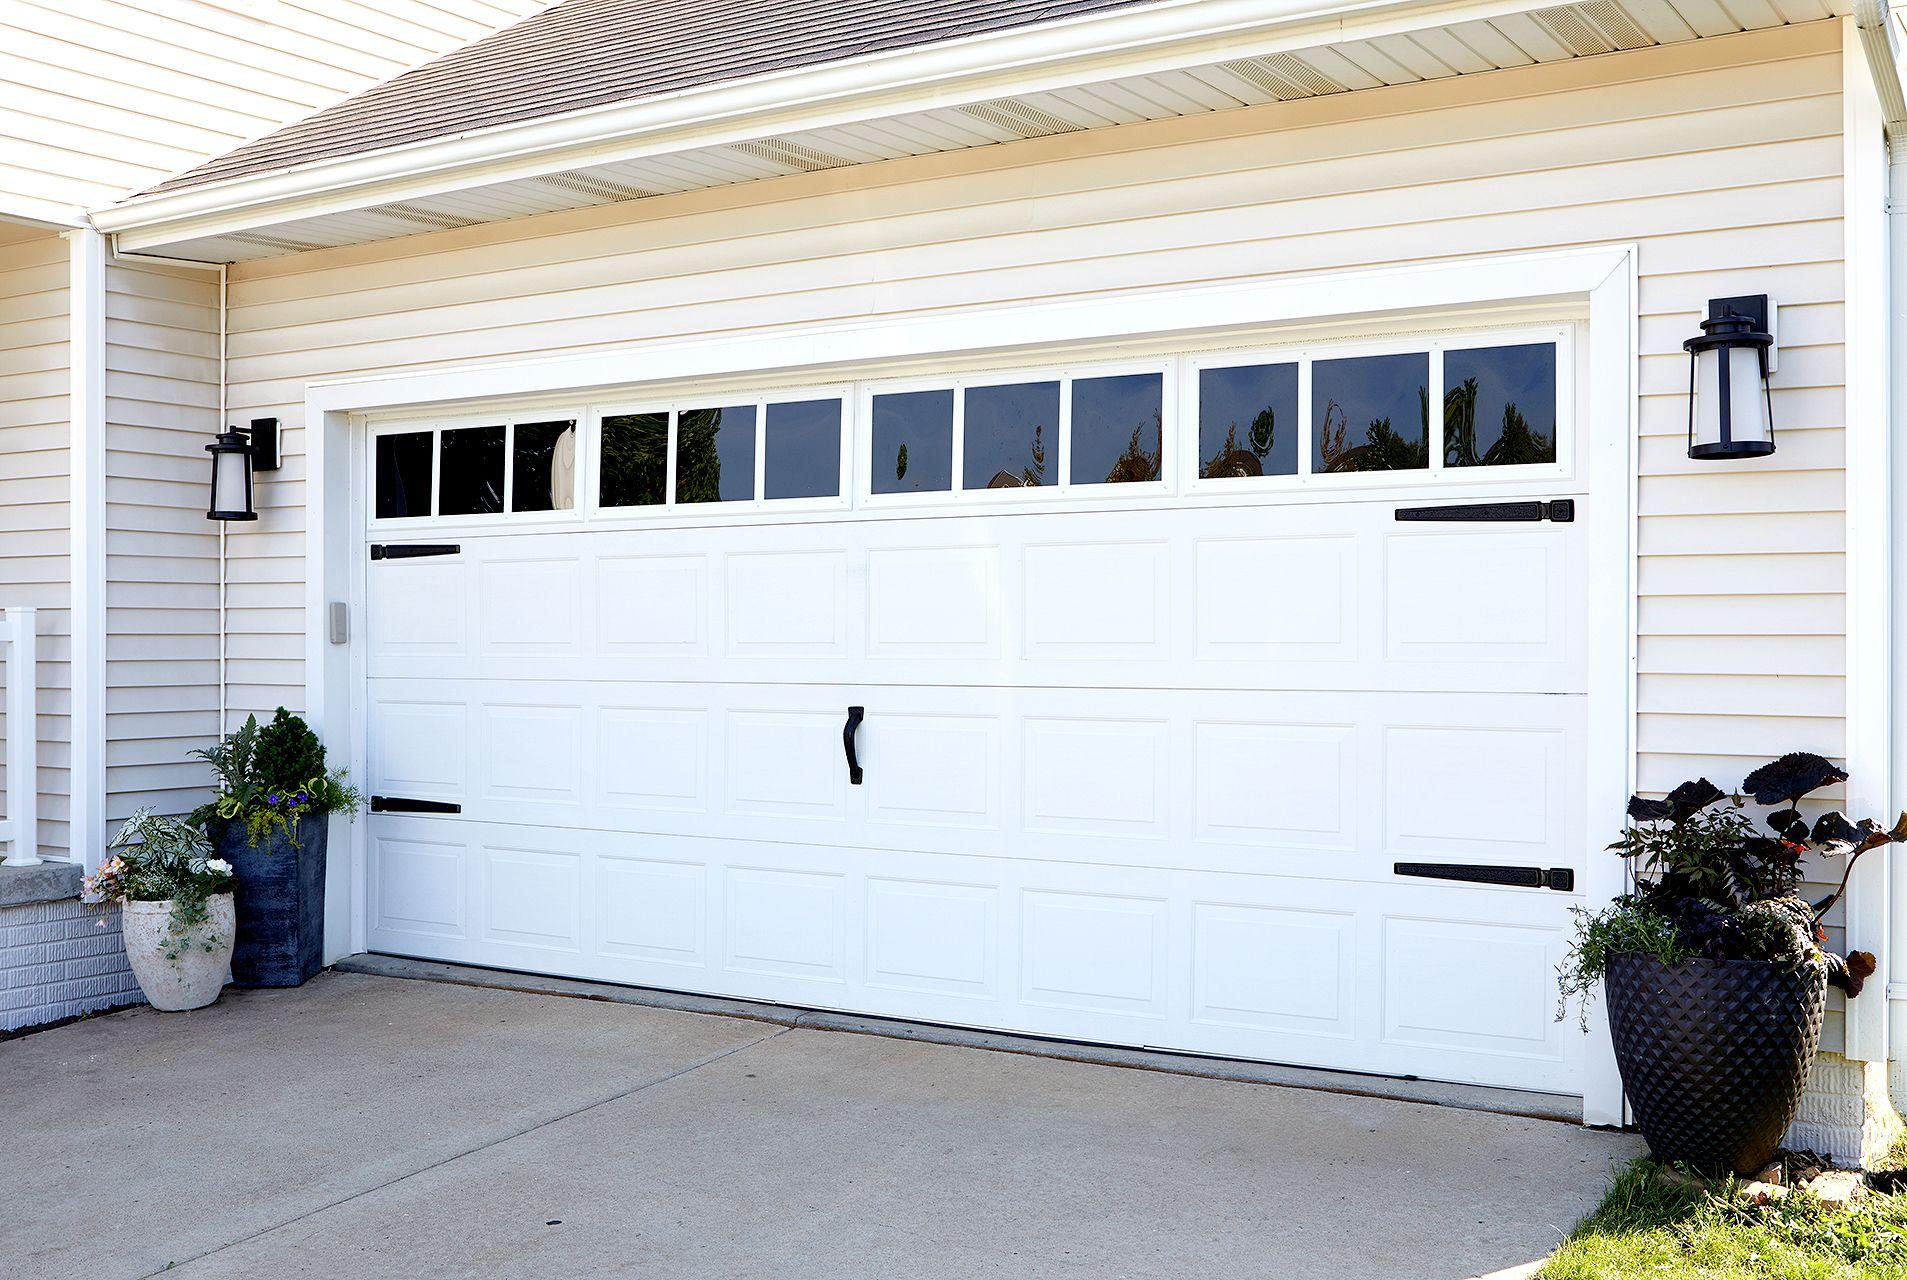 These Faux Garage Door Windows Are The Brightest Thing We Ve Ever Seen Garage Door Decor Garage Doors Faux Garage Door Windows